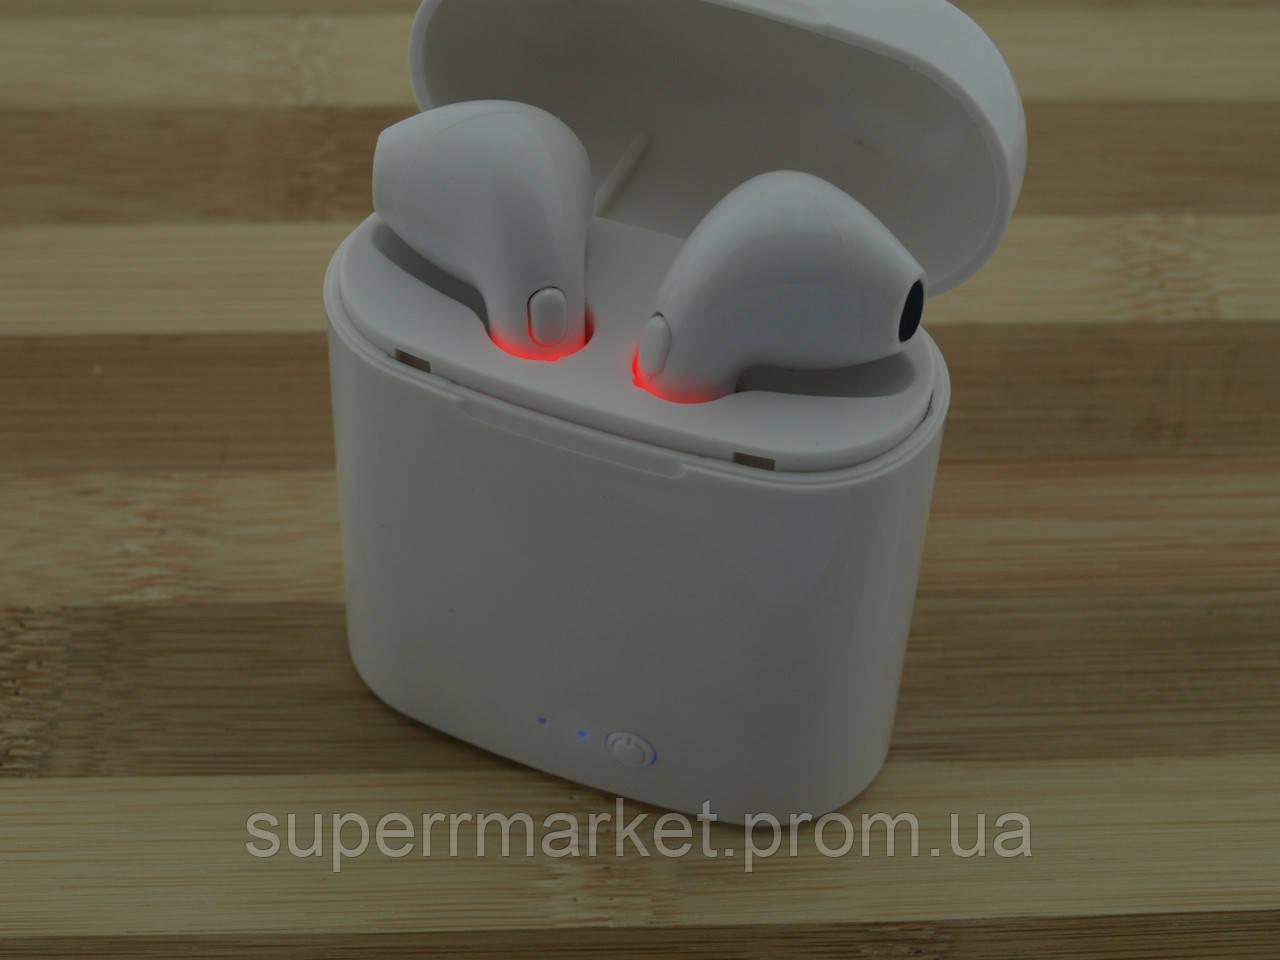 AirPods i7s case MDR TWS гарнитура в стиле apple, Bluetooth headset наушники-гарнитура, белая